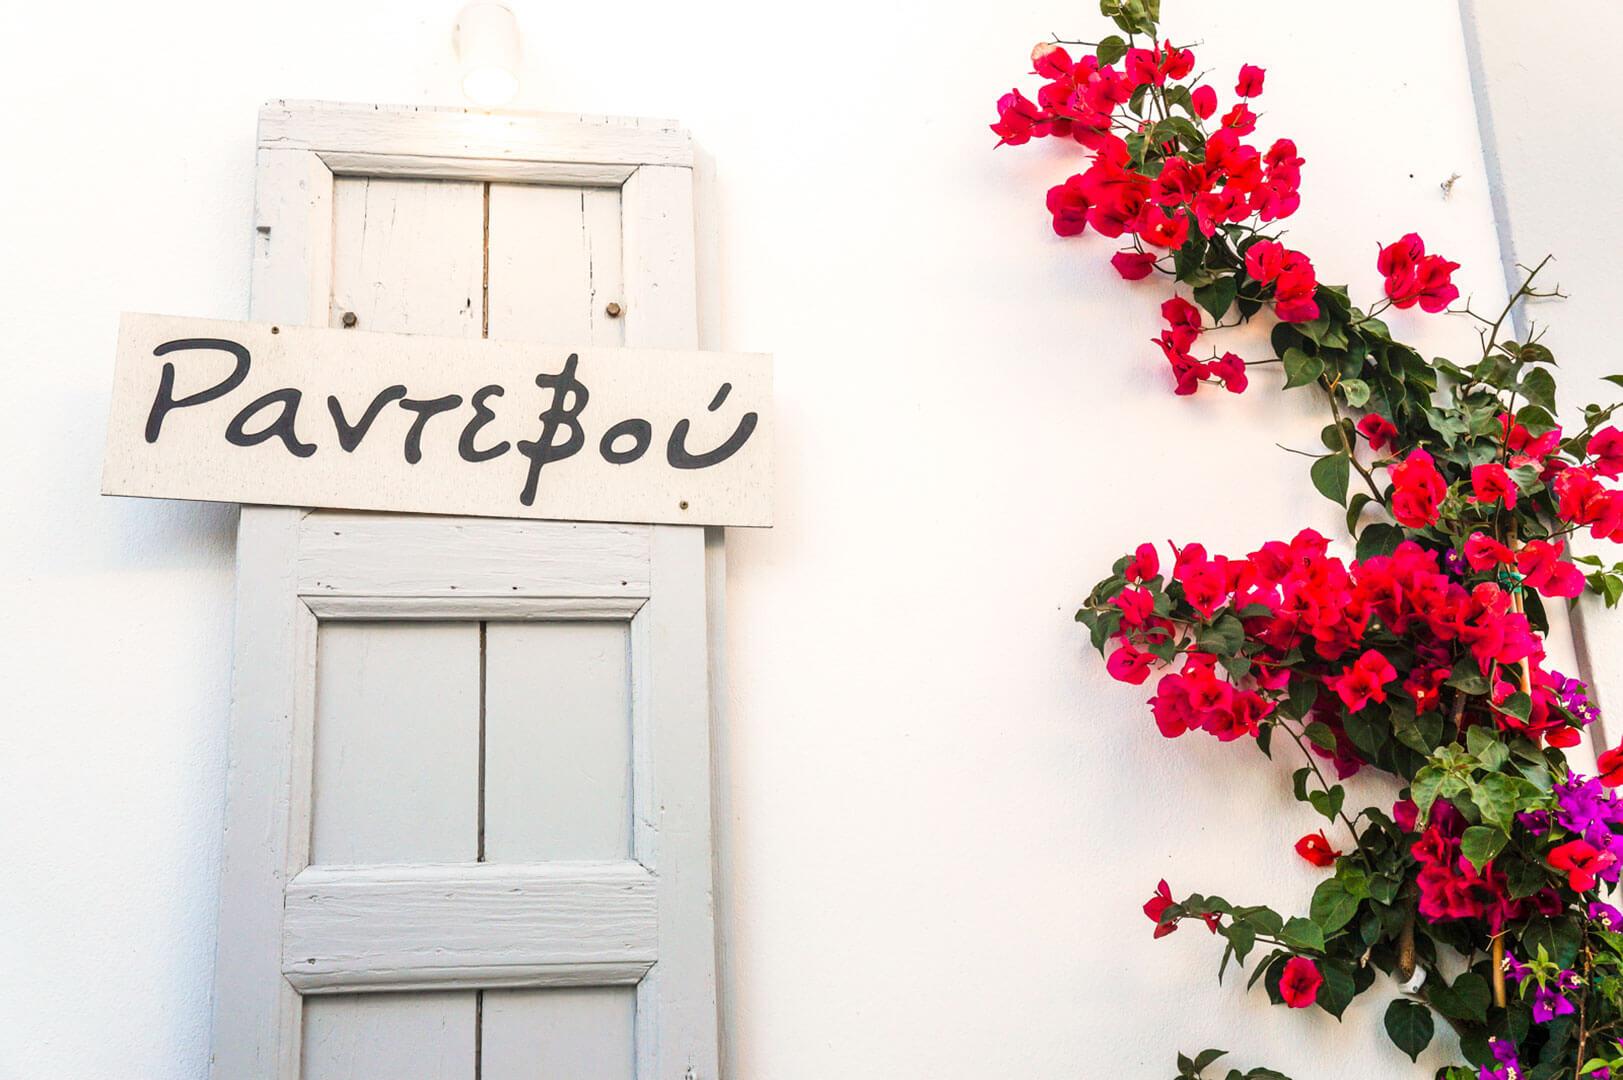 antiparos-greece-la-vie-en-blog-all-rights-reserved-63